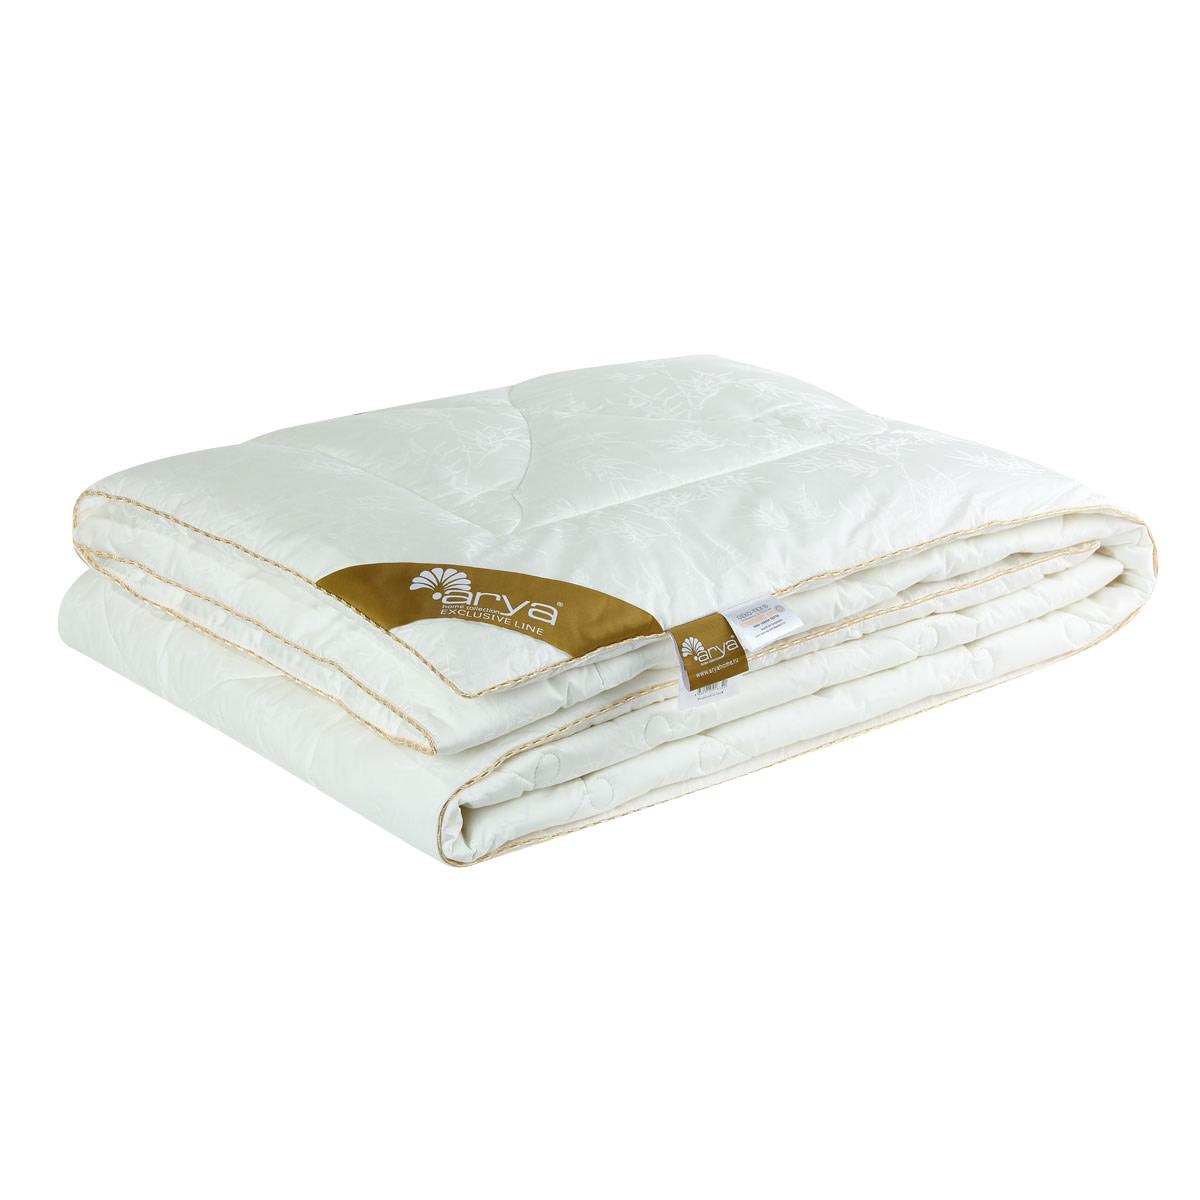 Одеяло Arya home collection Bamboo-Kun 215х195 см синтепон